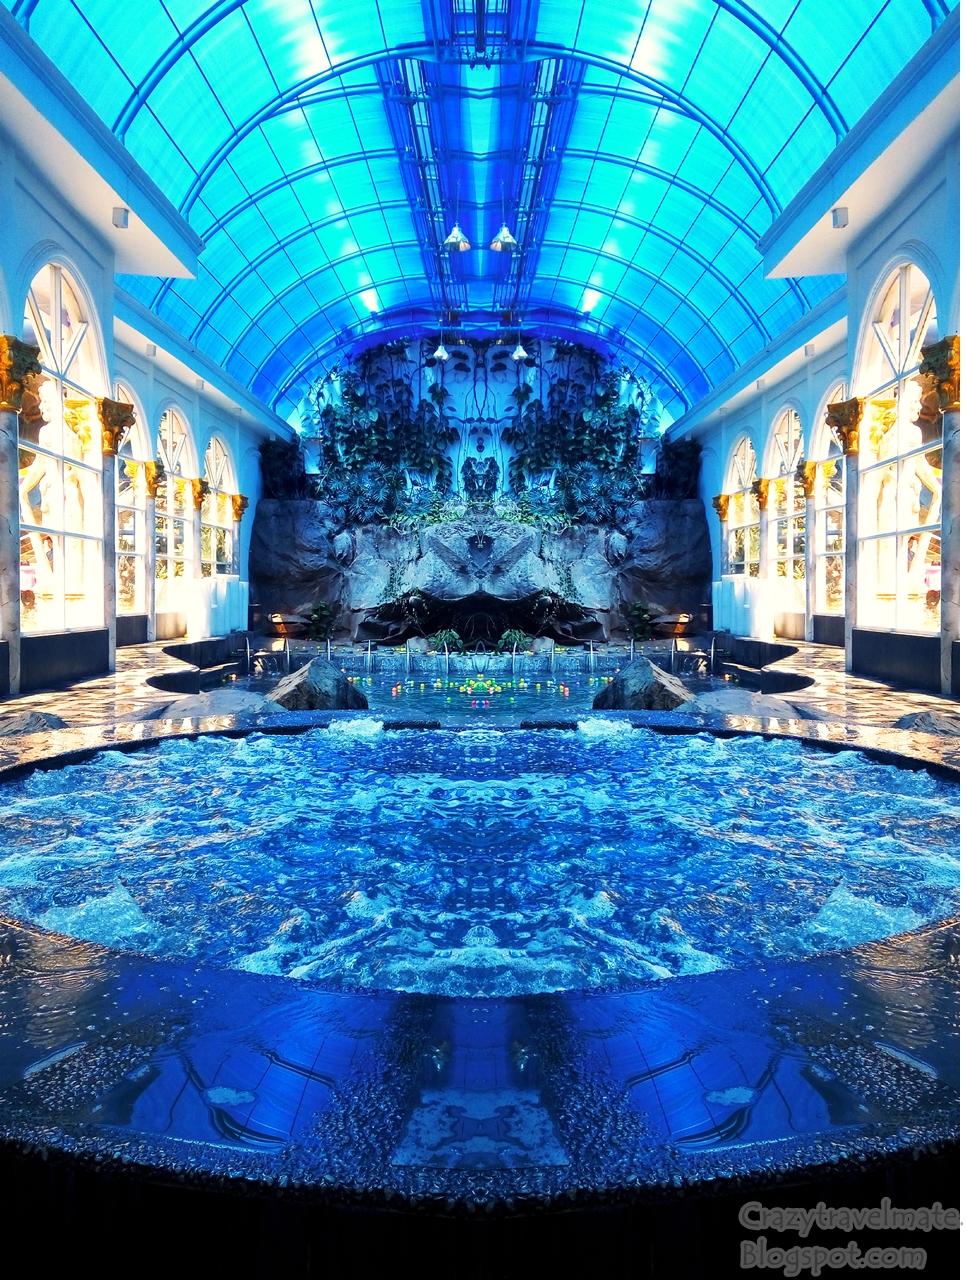 Grand Paradise Lembang : grand, paradise, lembang, Blogger, Addict:, Experience, Grand, Paradise